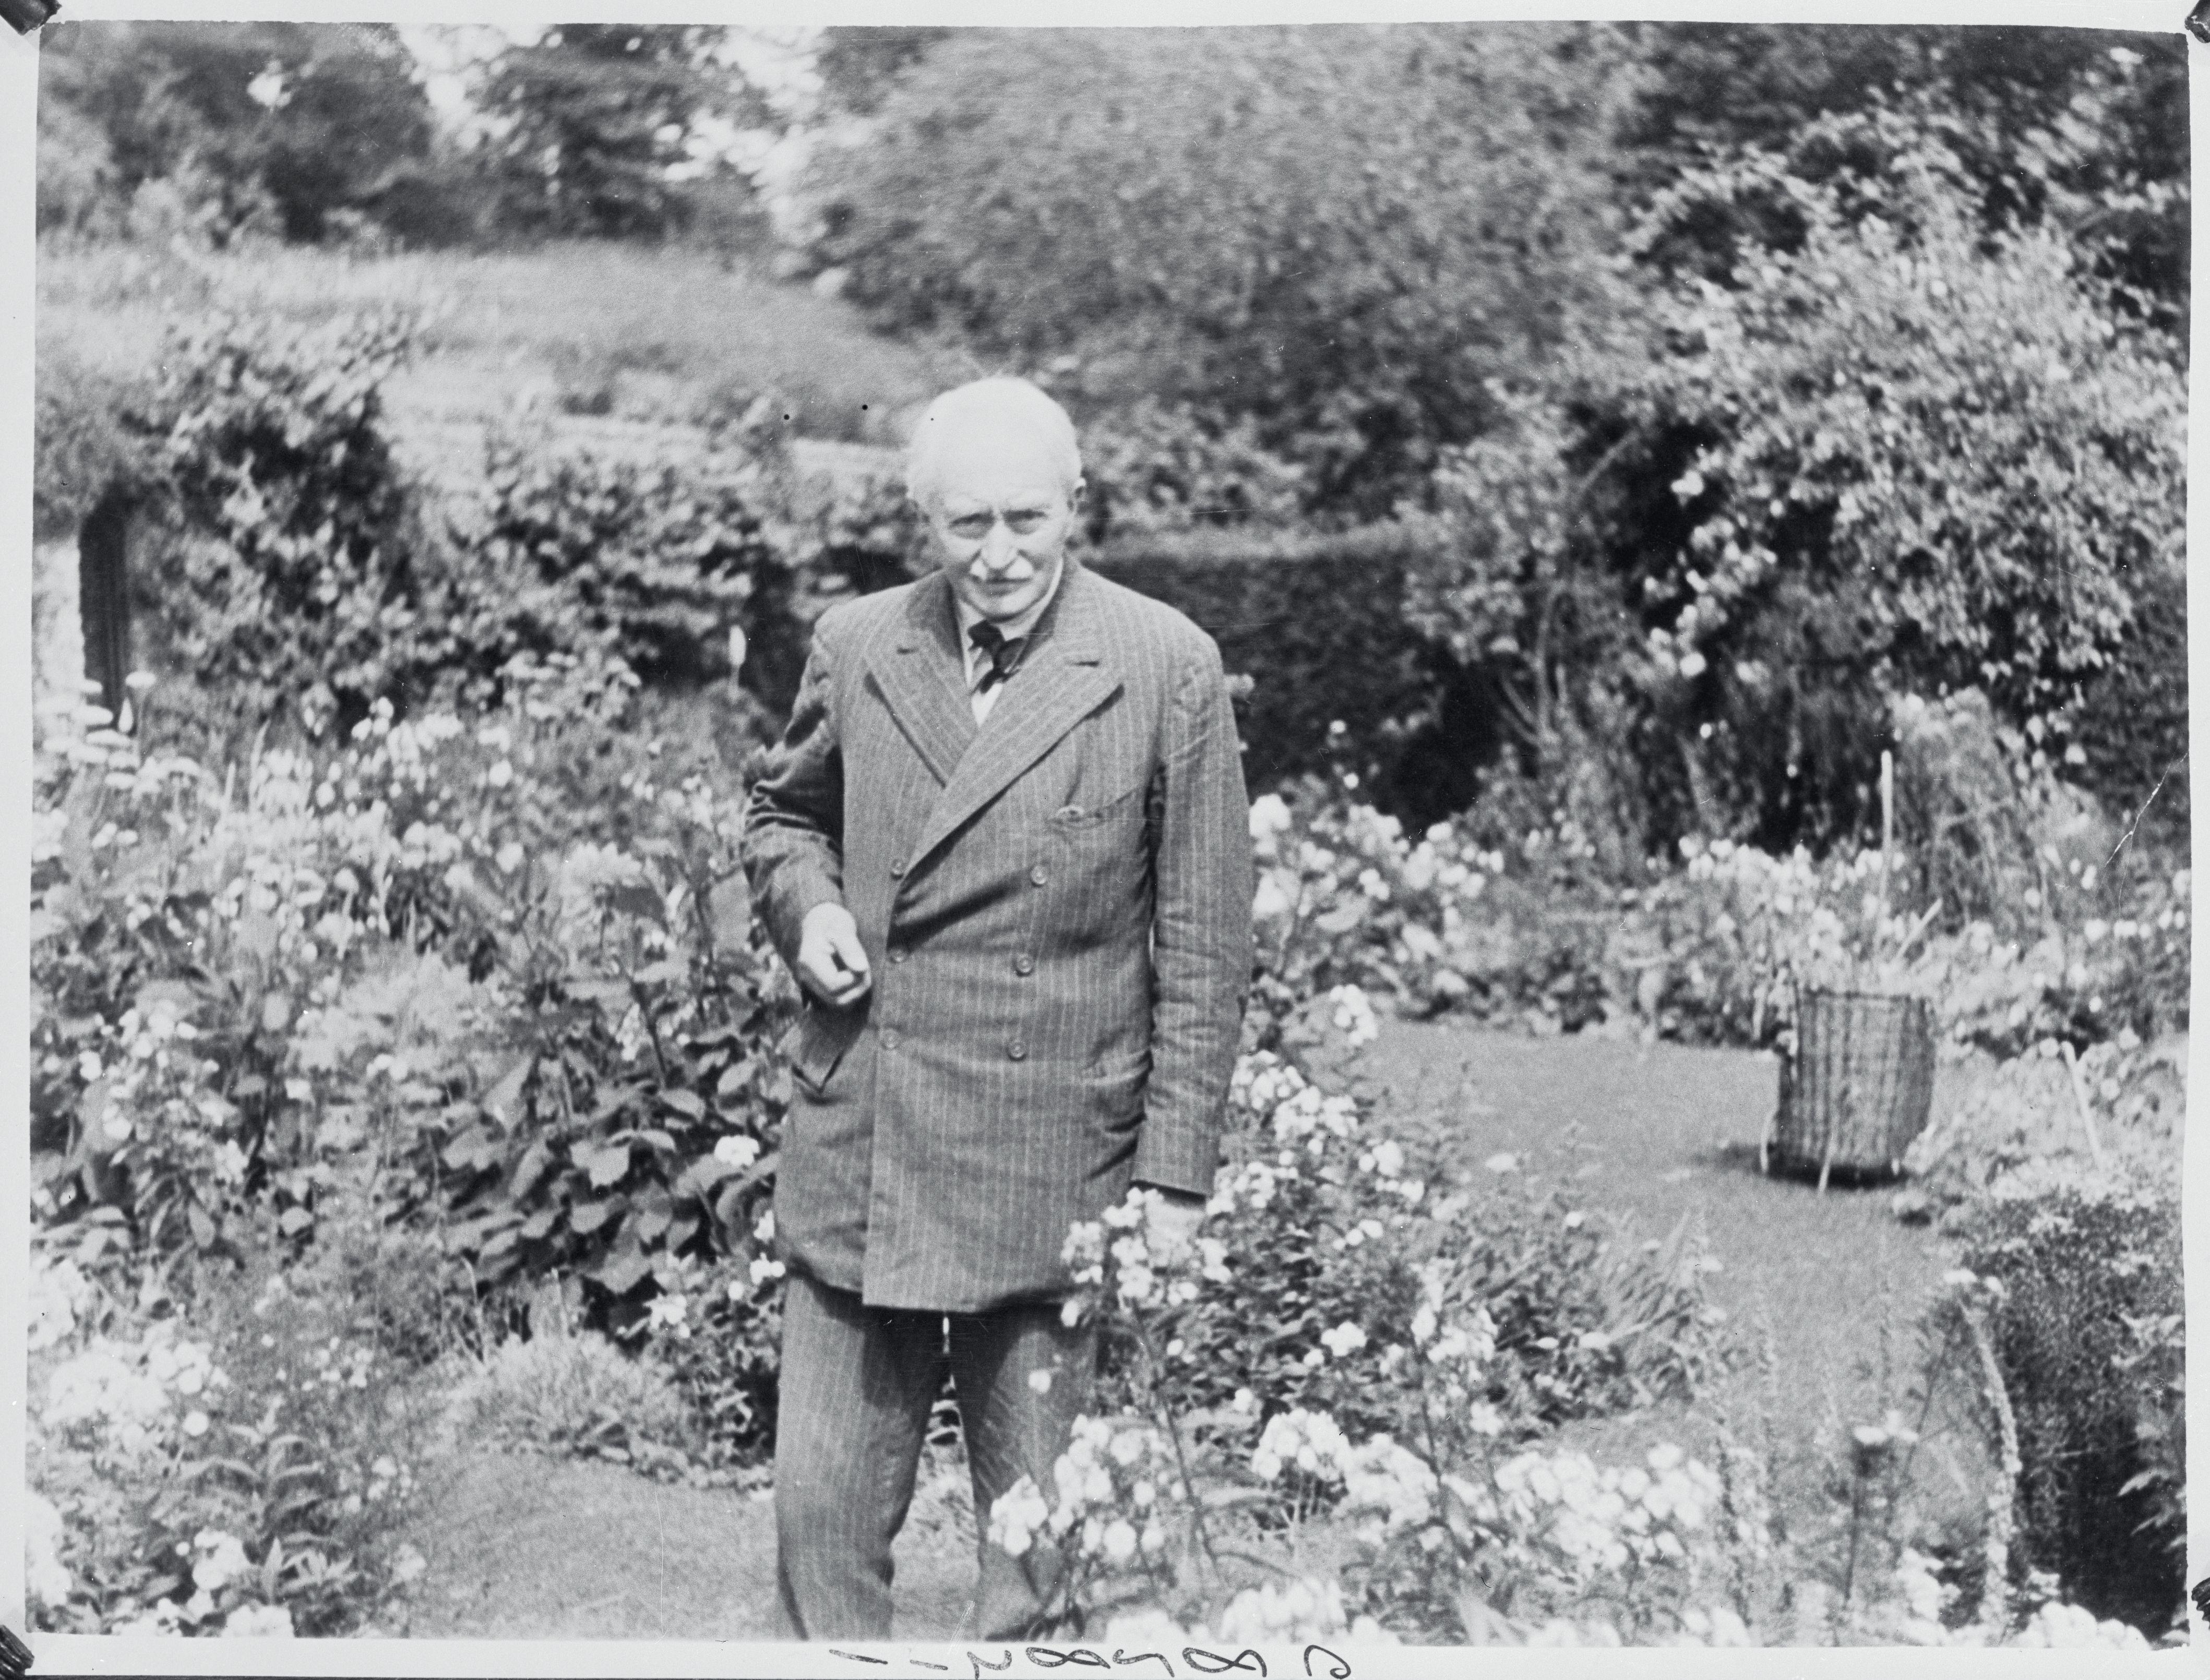 Portrait of Poet Laureate of England John Masefield